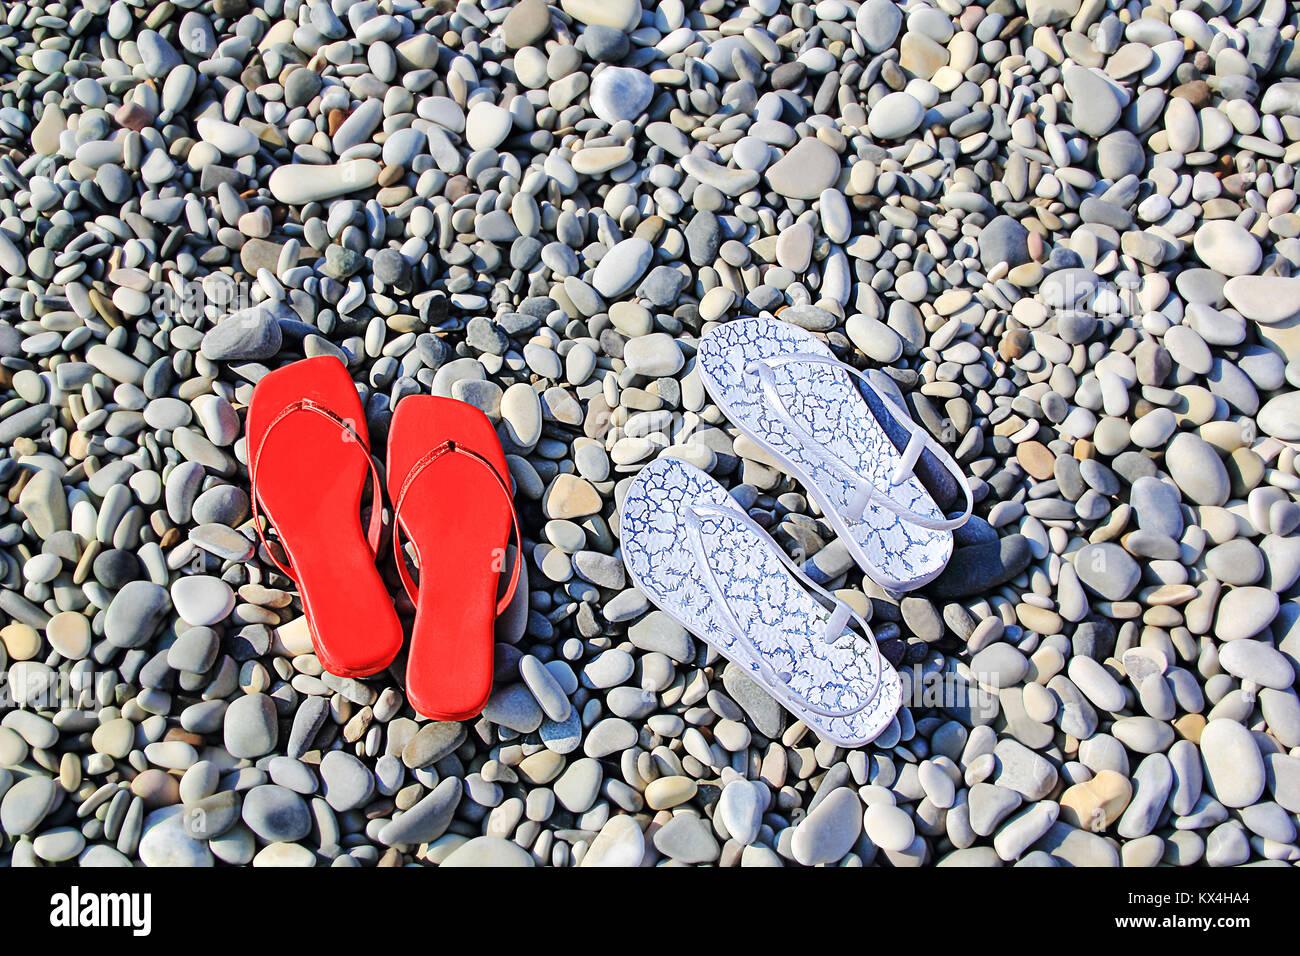 Image of varicoloured feminine schists on beach - Stock Image